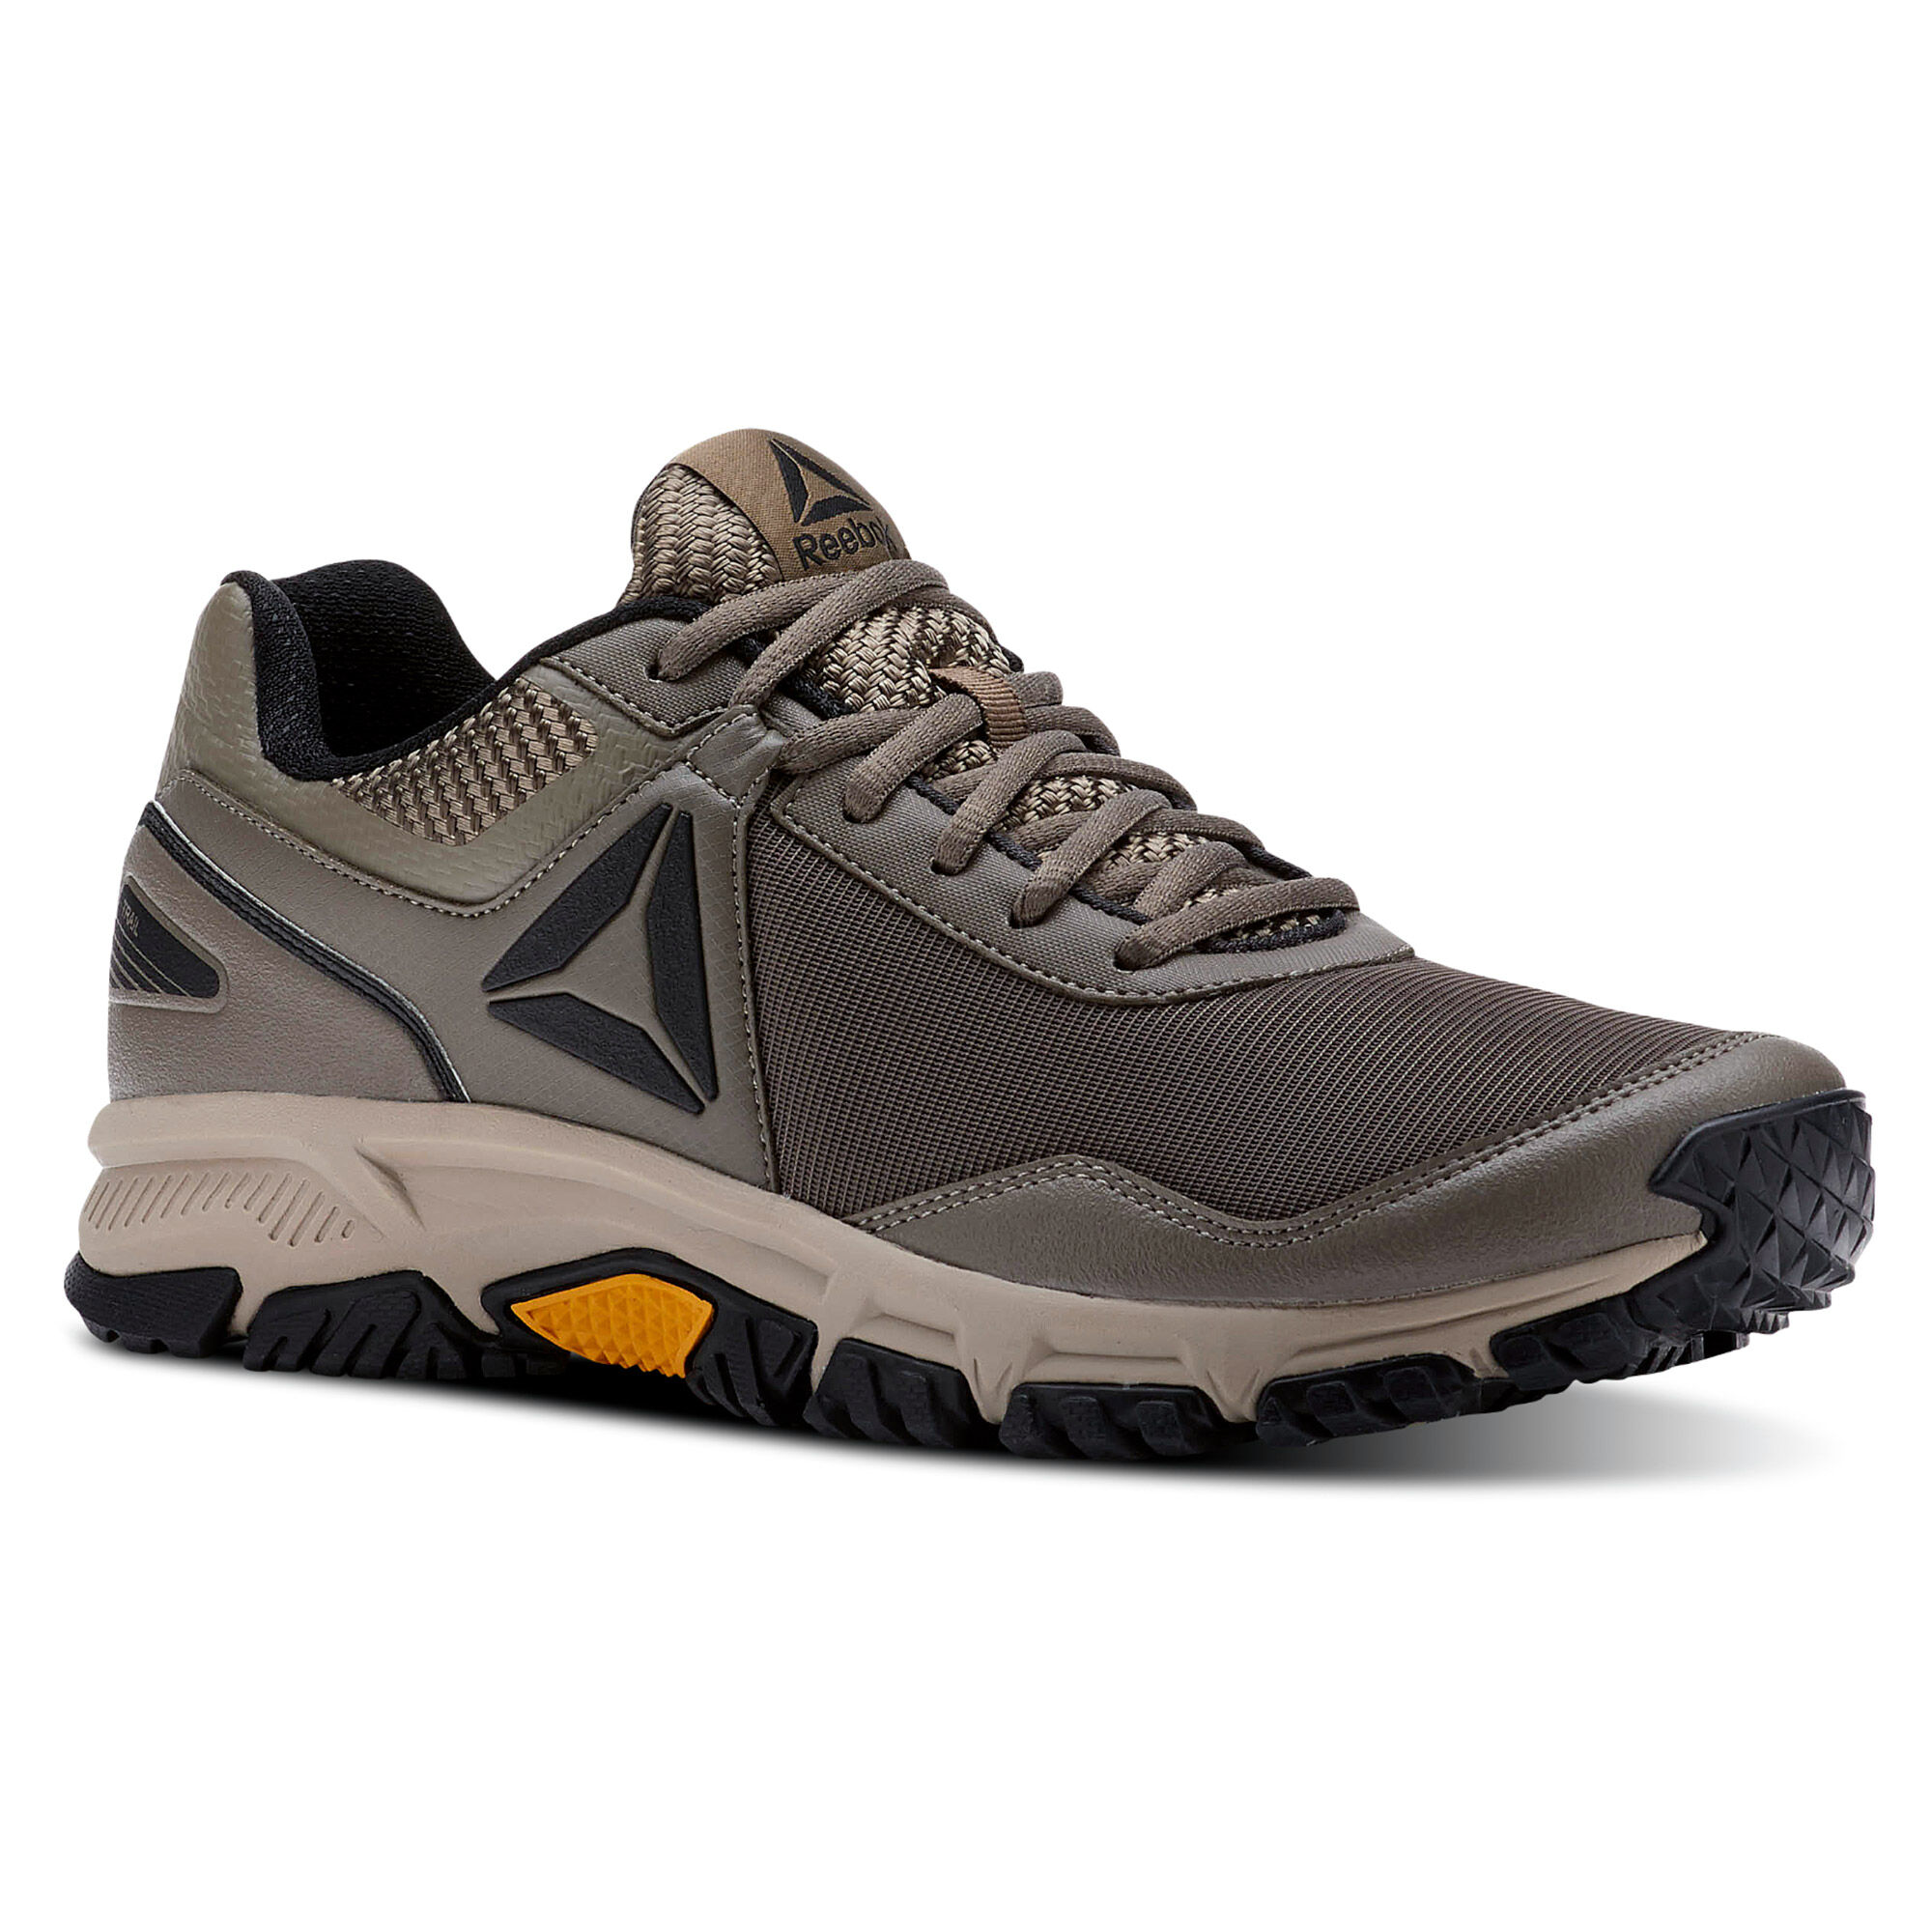 Reebok RIDGERIDER TRAIL 3.0 - Trail running shoes - grey/khaki/coal/gold zY23QePb